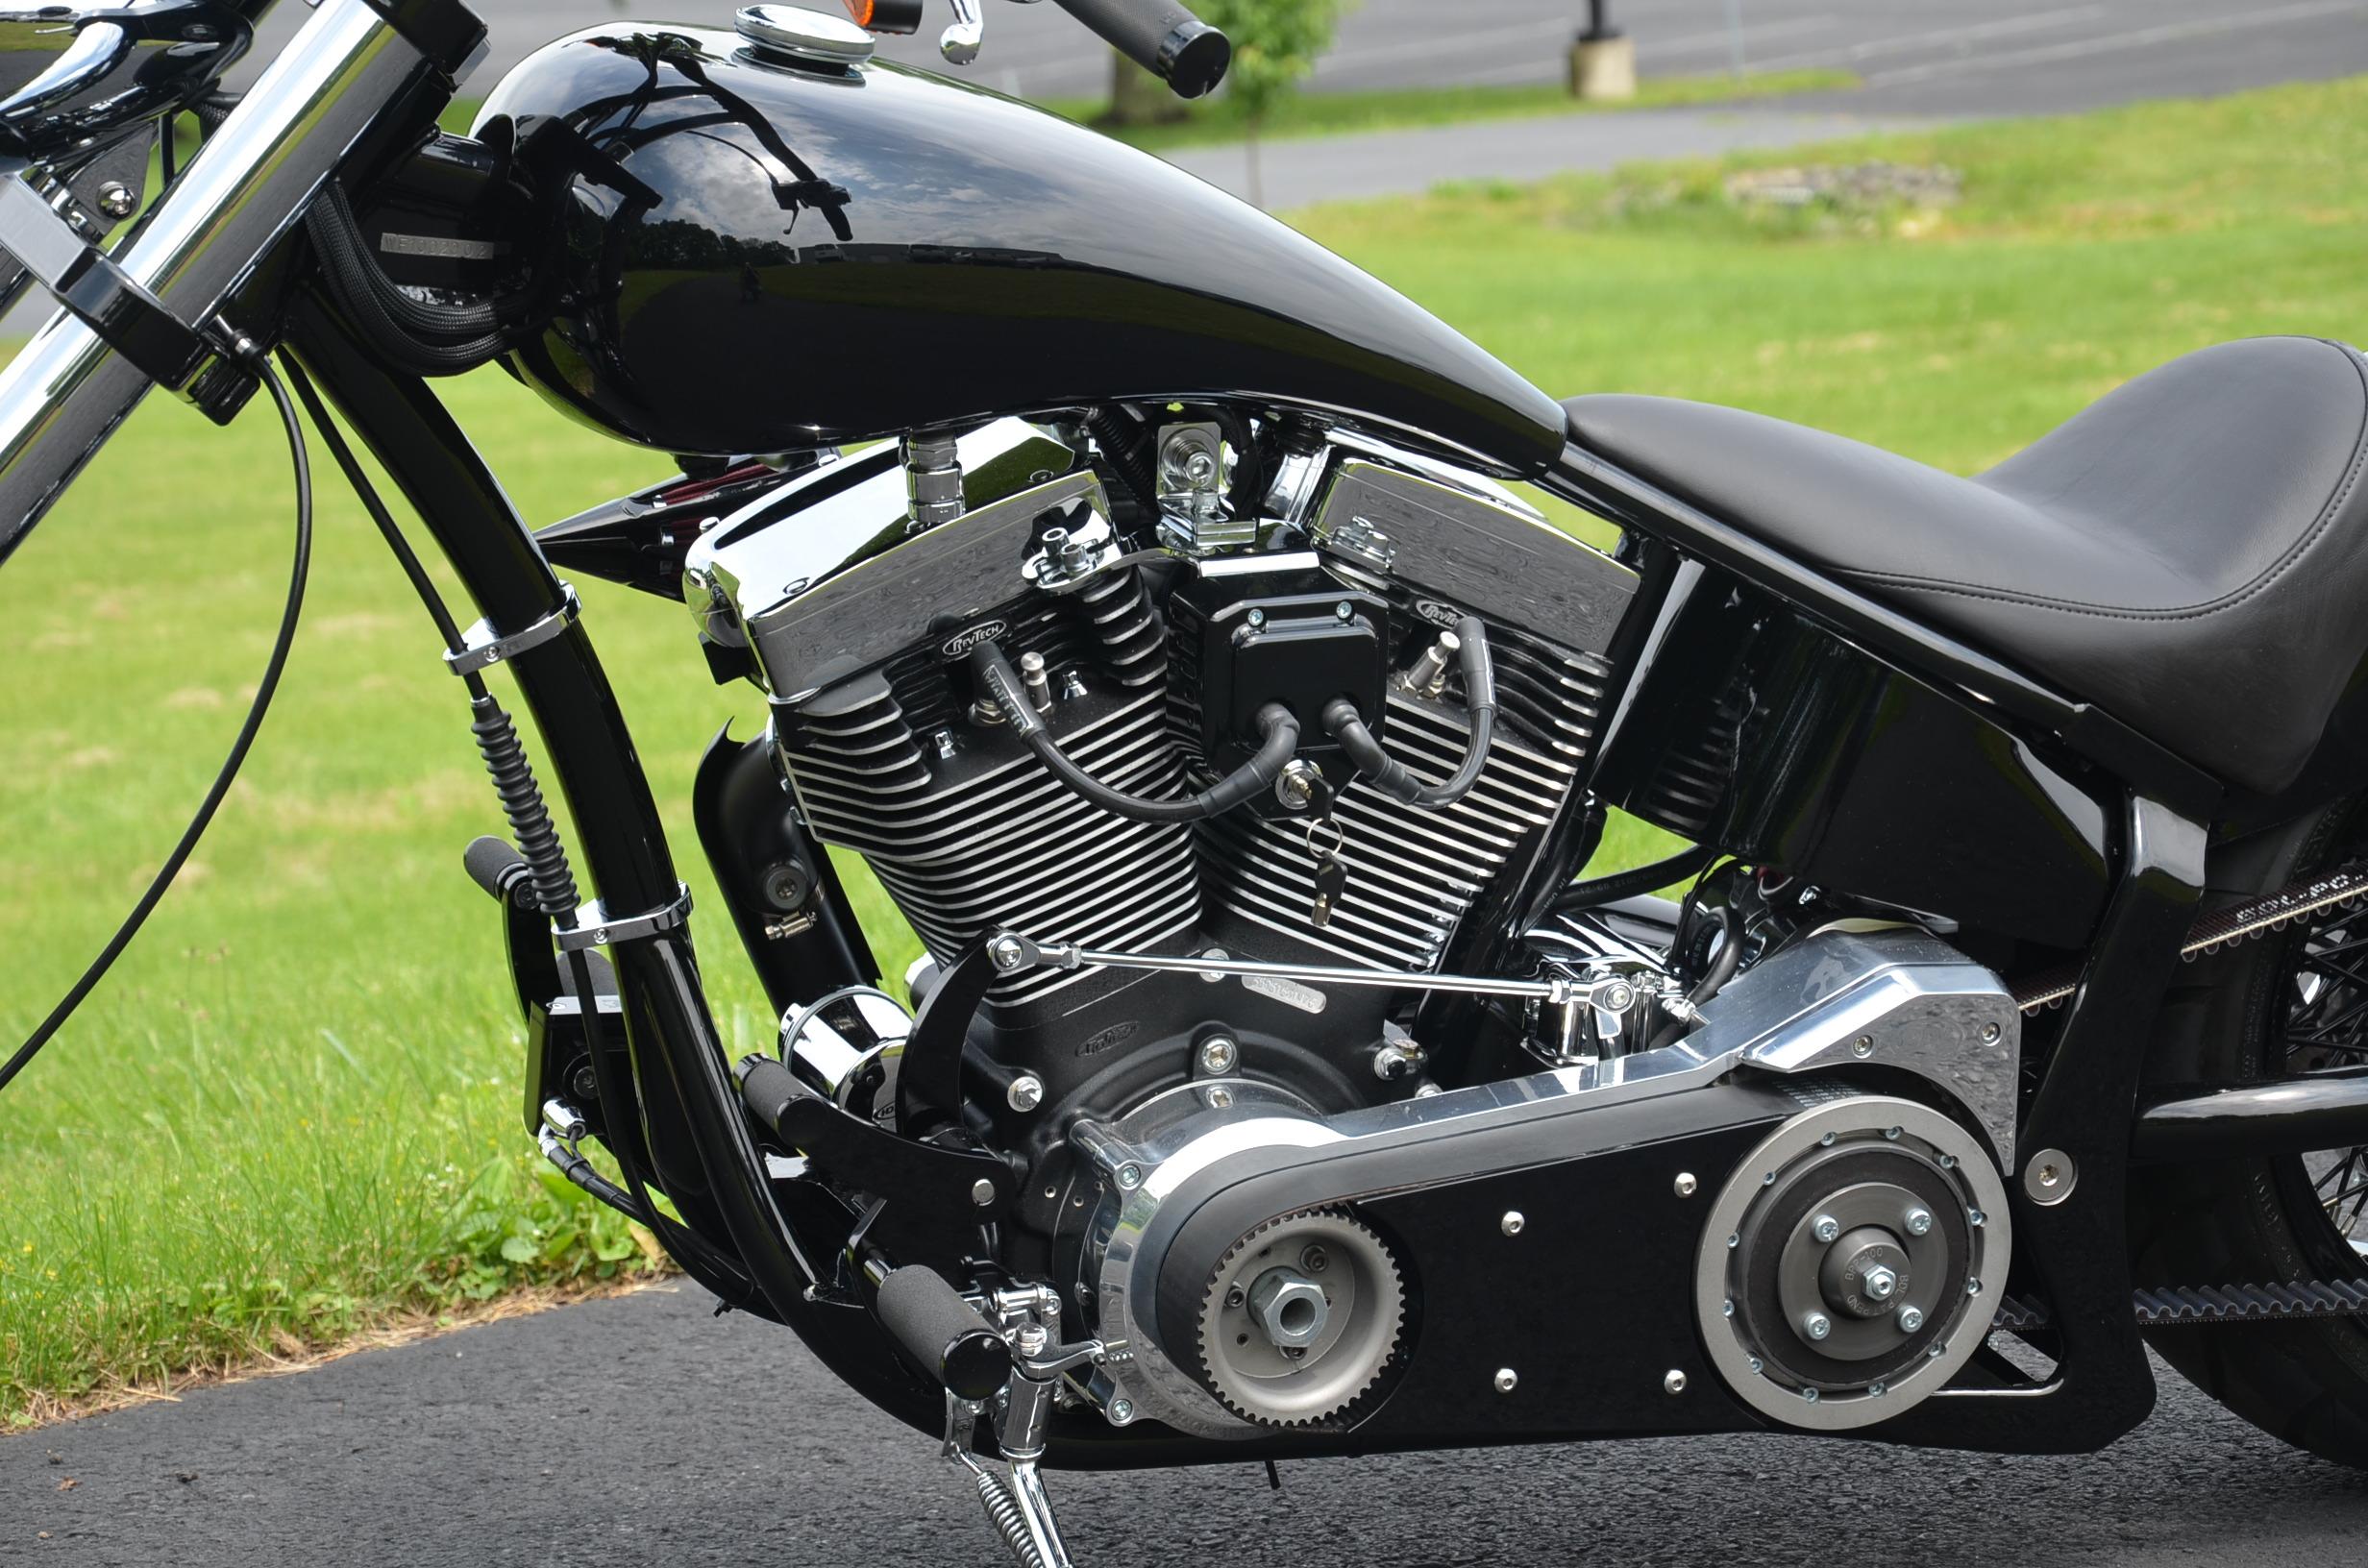 CUSTOM CHOPPER Motorbike Tuning Bike Hot Rod Rods Engine F